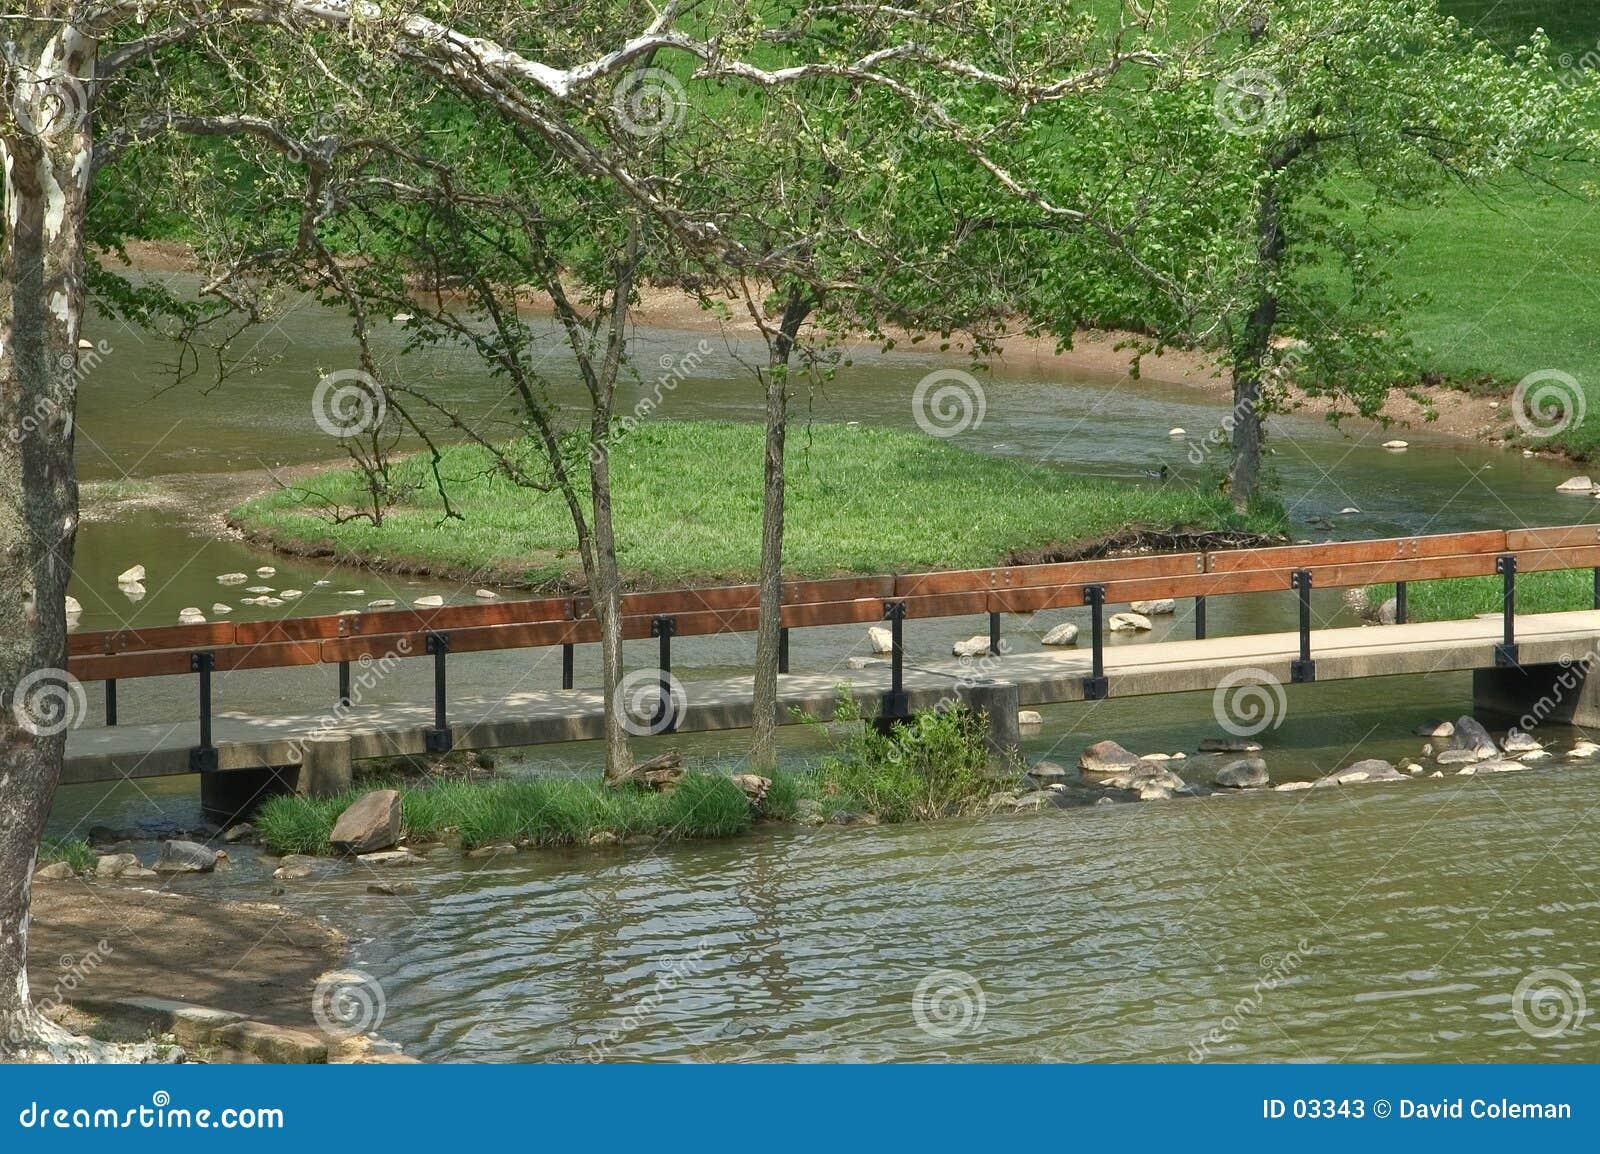 Stopa bridge